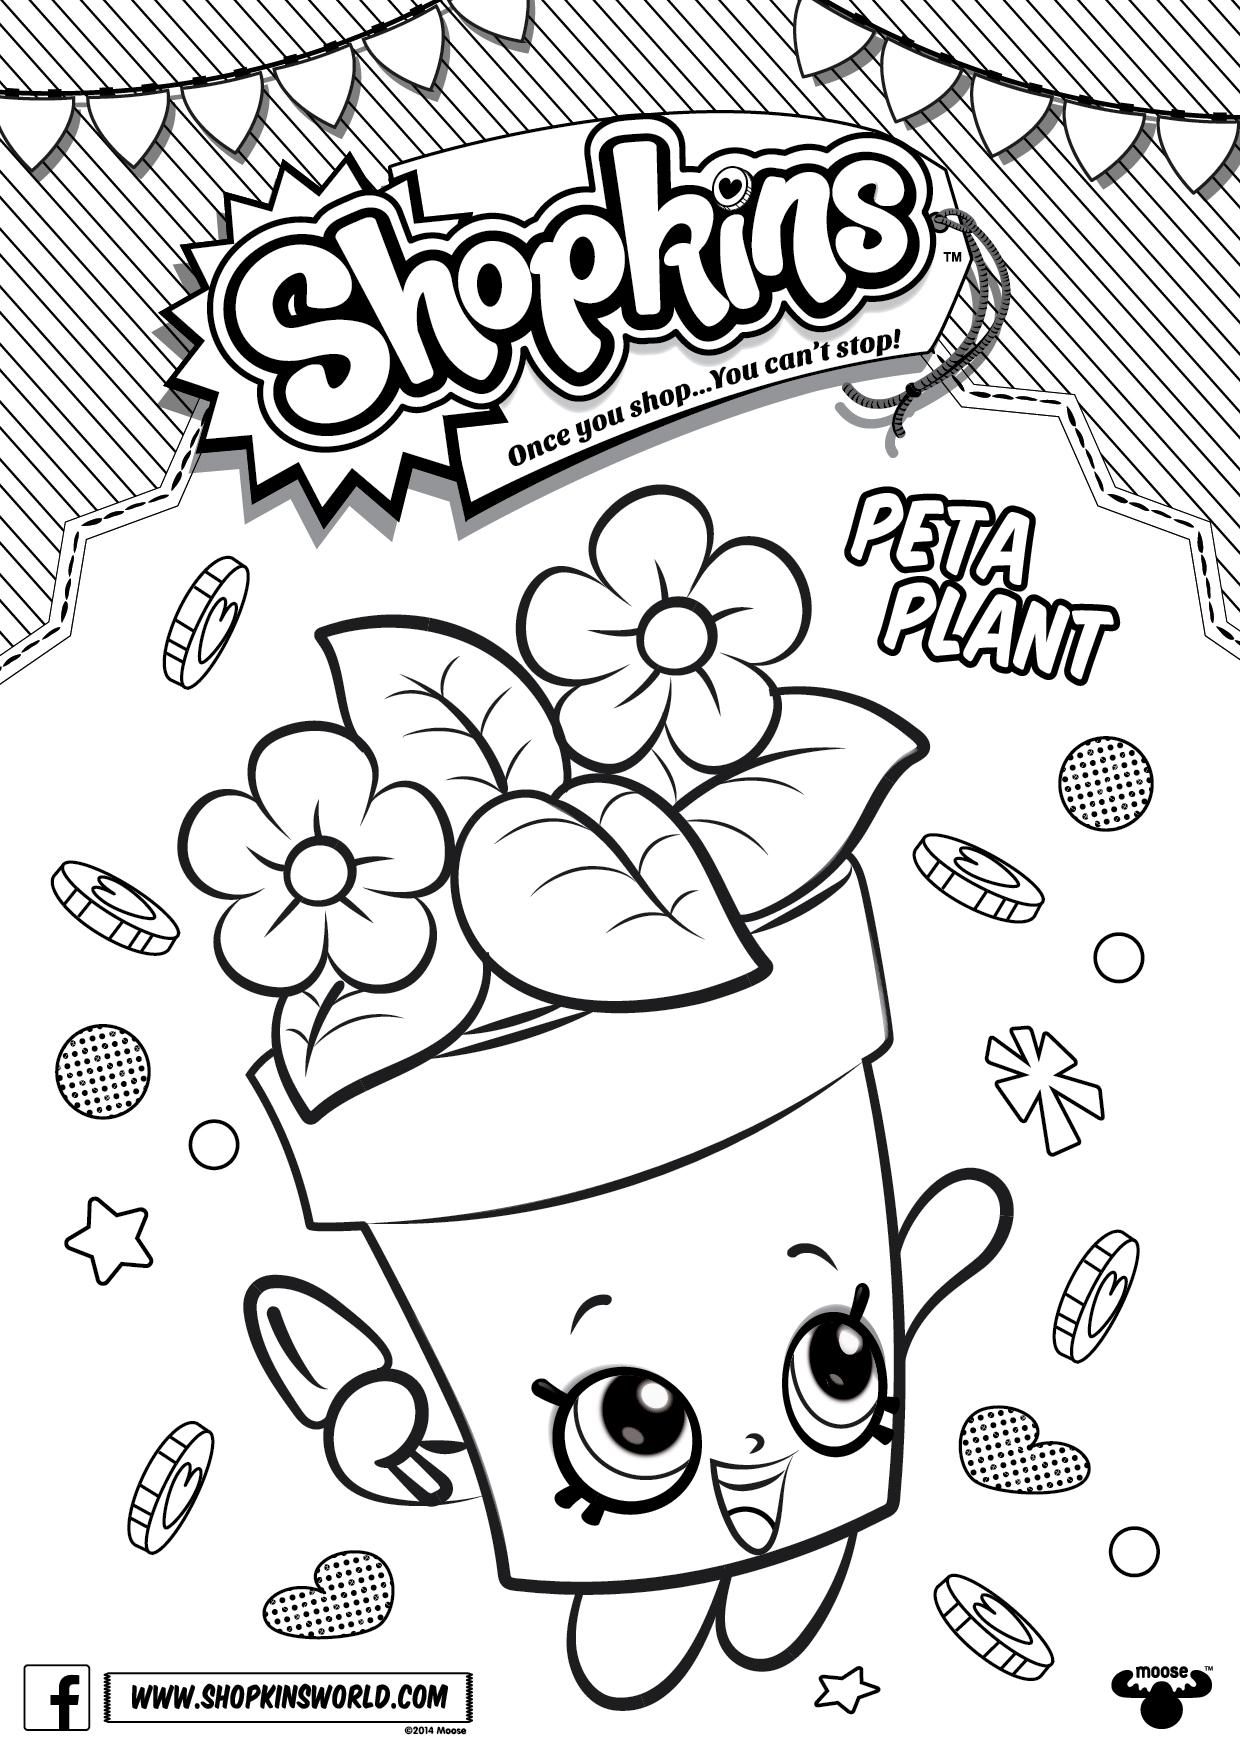 Shopkins clipart snow crush graphic freeuse library Shopkins clipart snow crush - ClipartFest graphic freeuse library